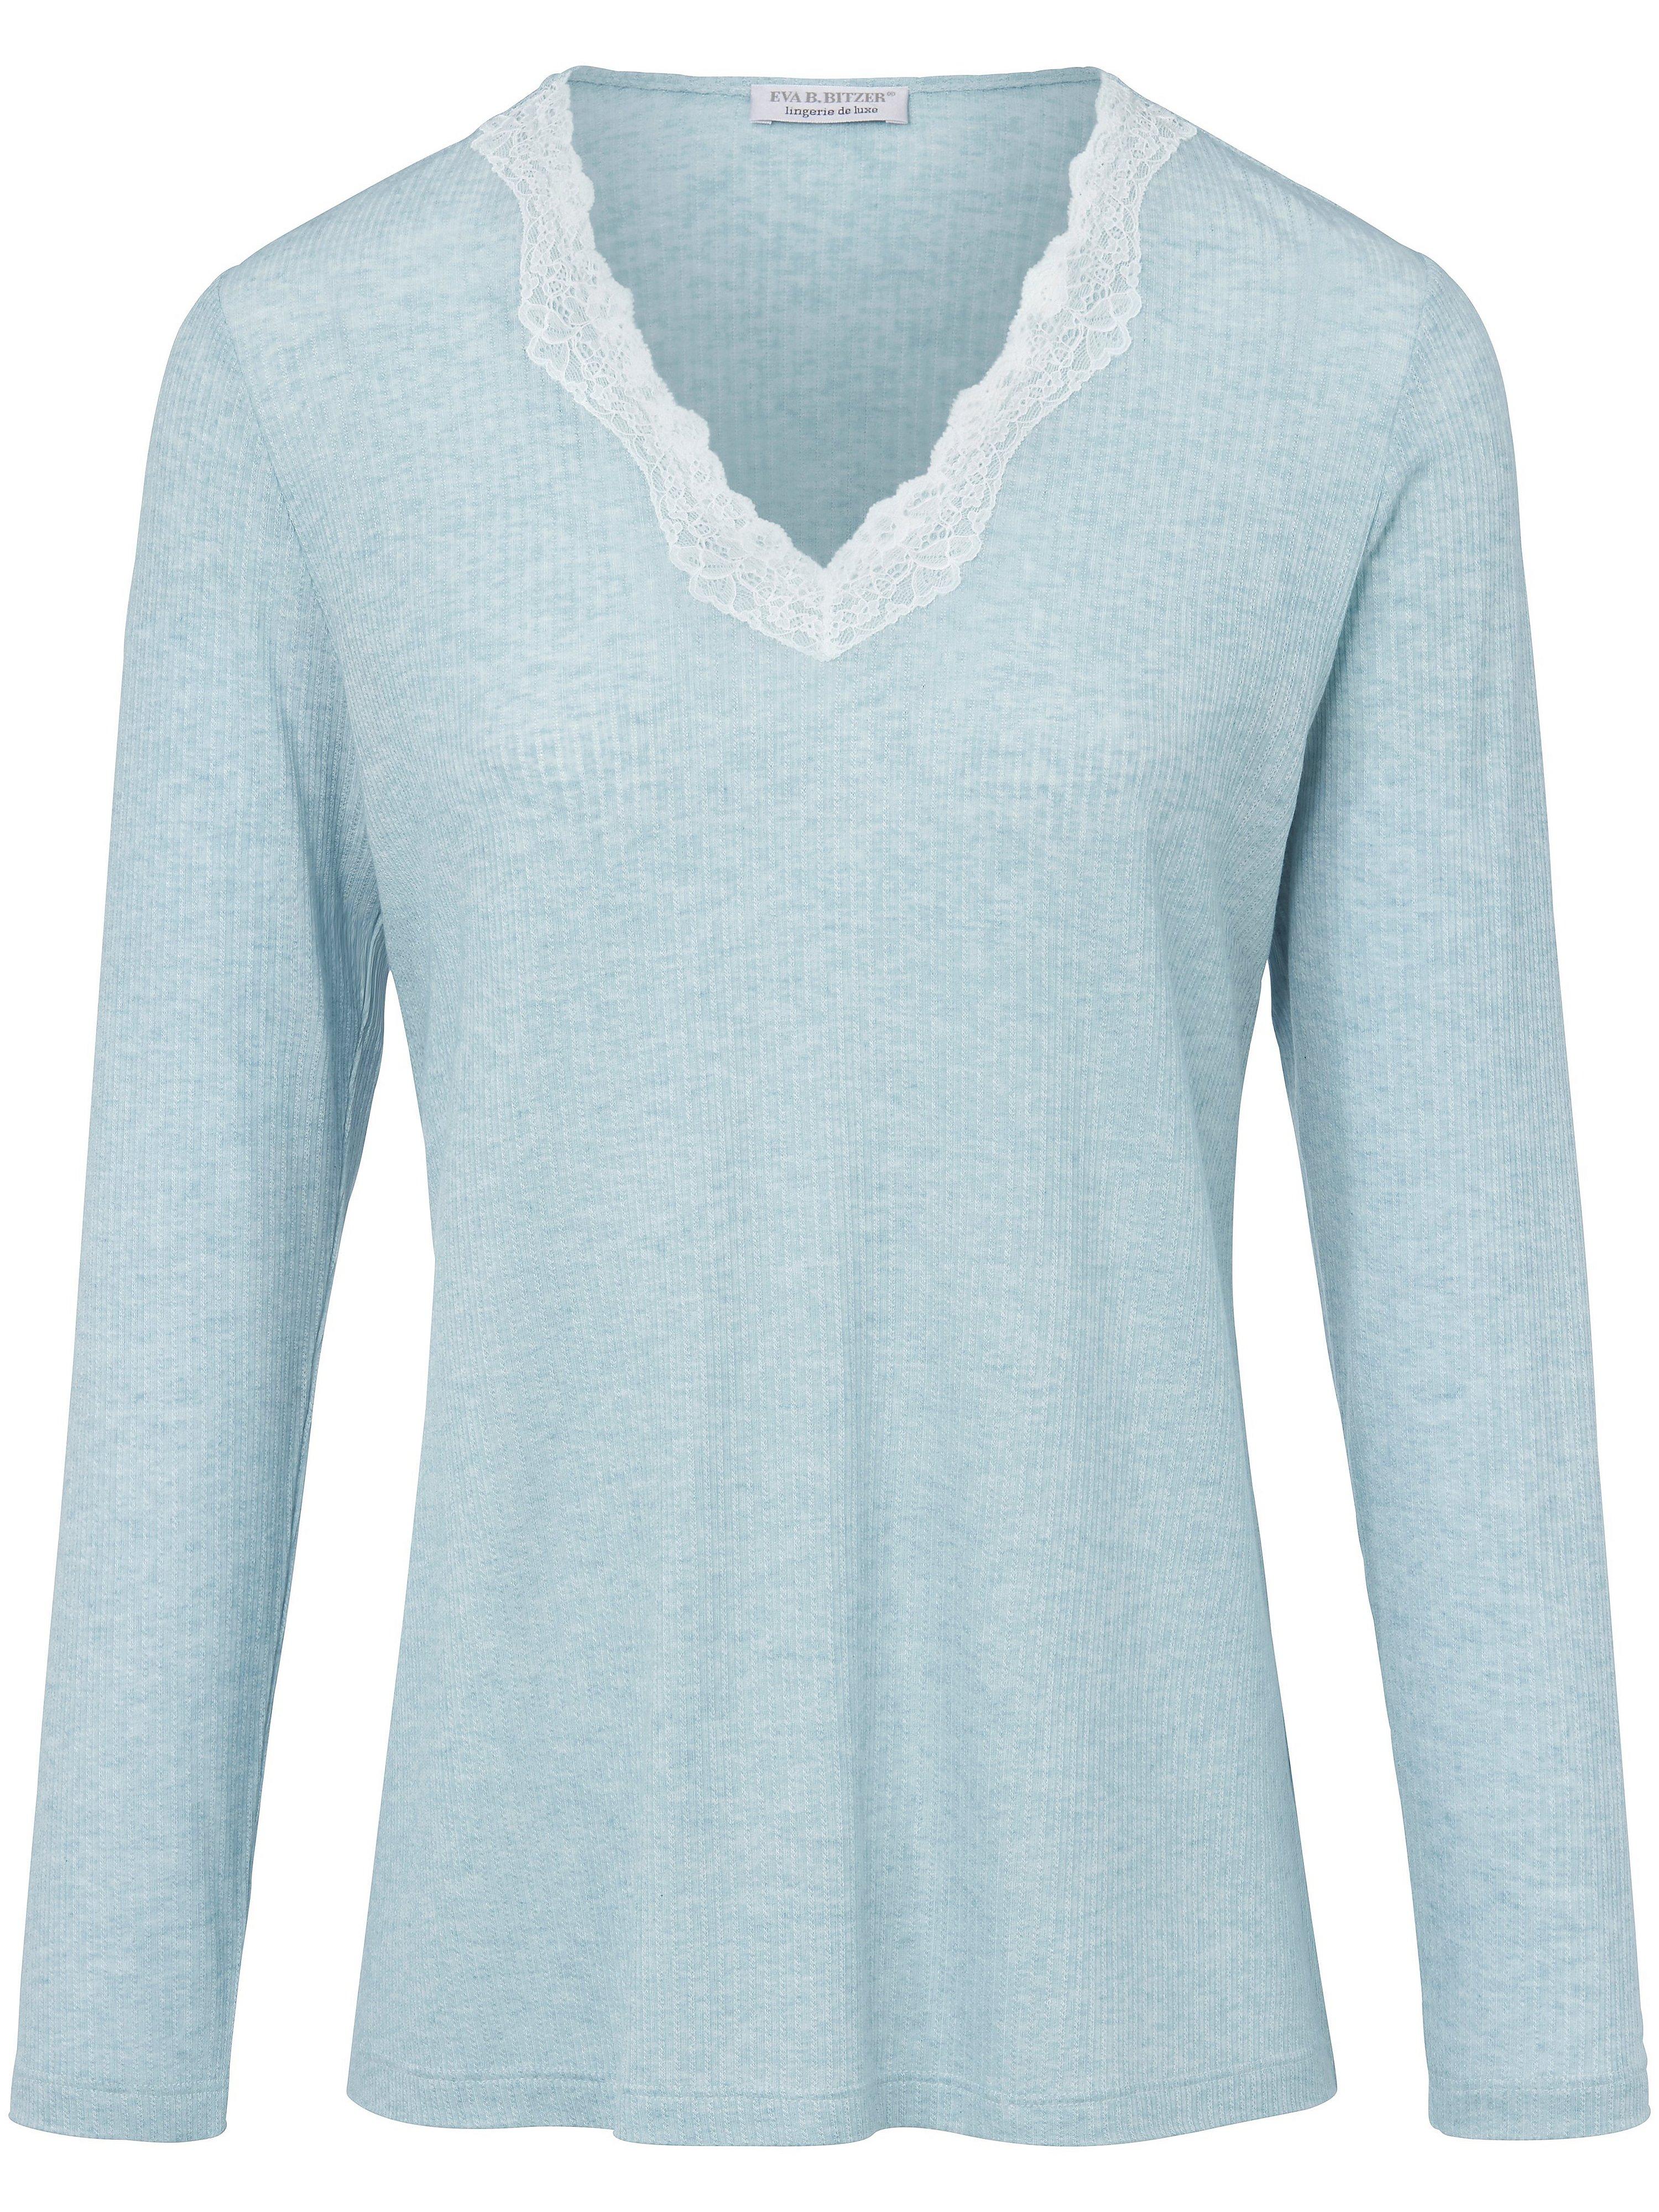 Le pyjama  Eva B. Bitzer bleu taille 44